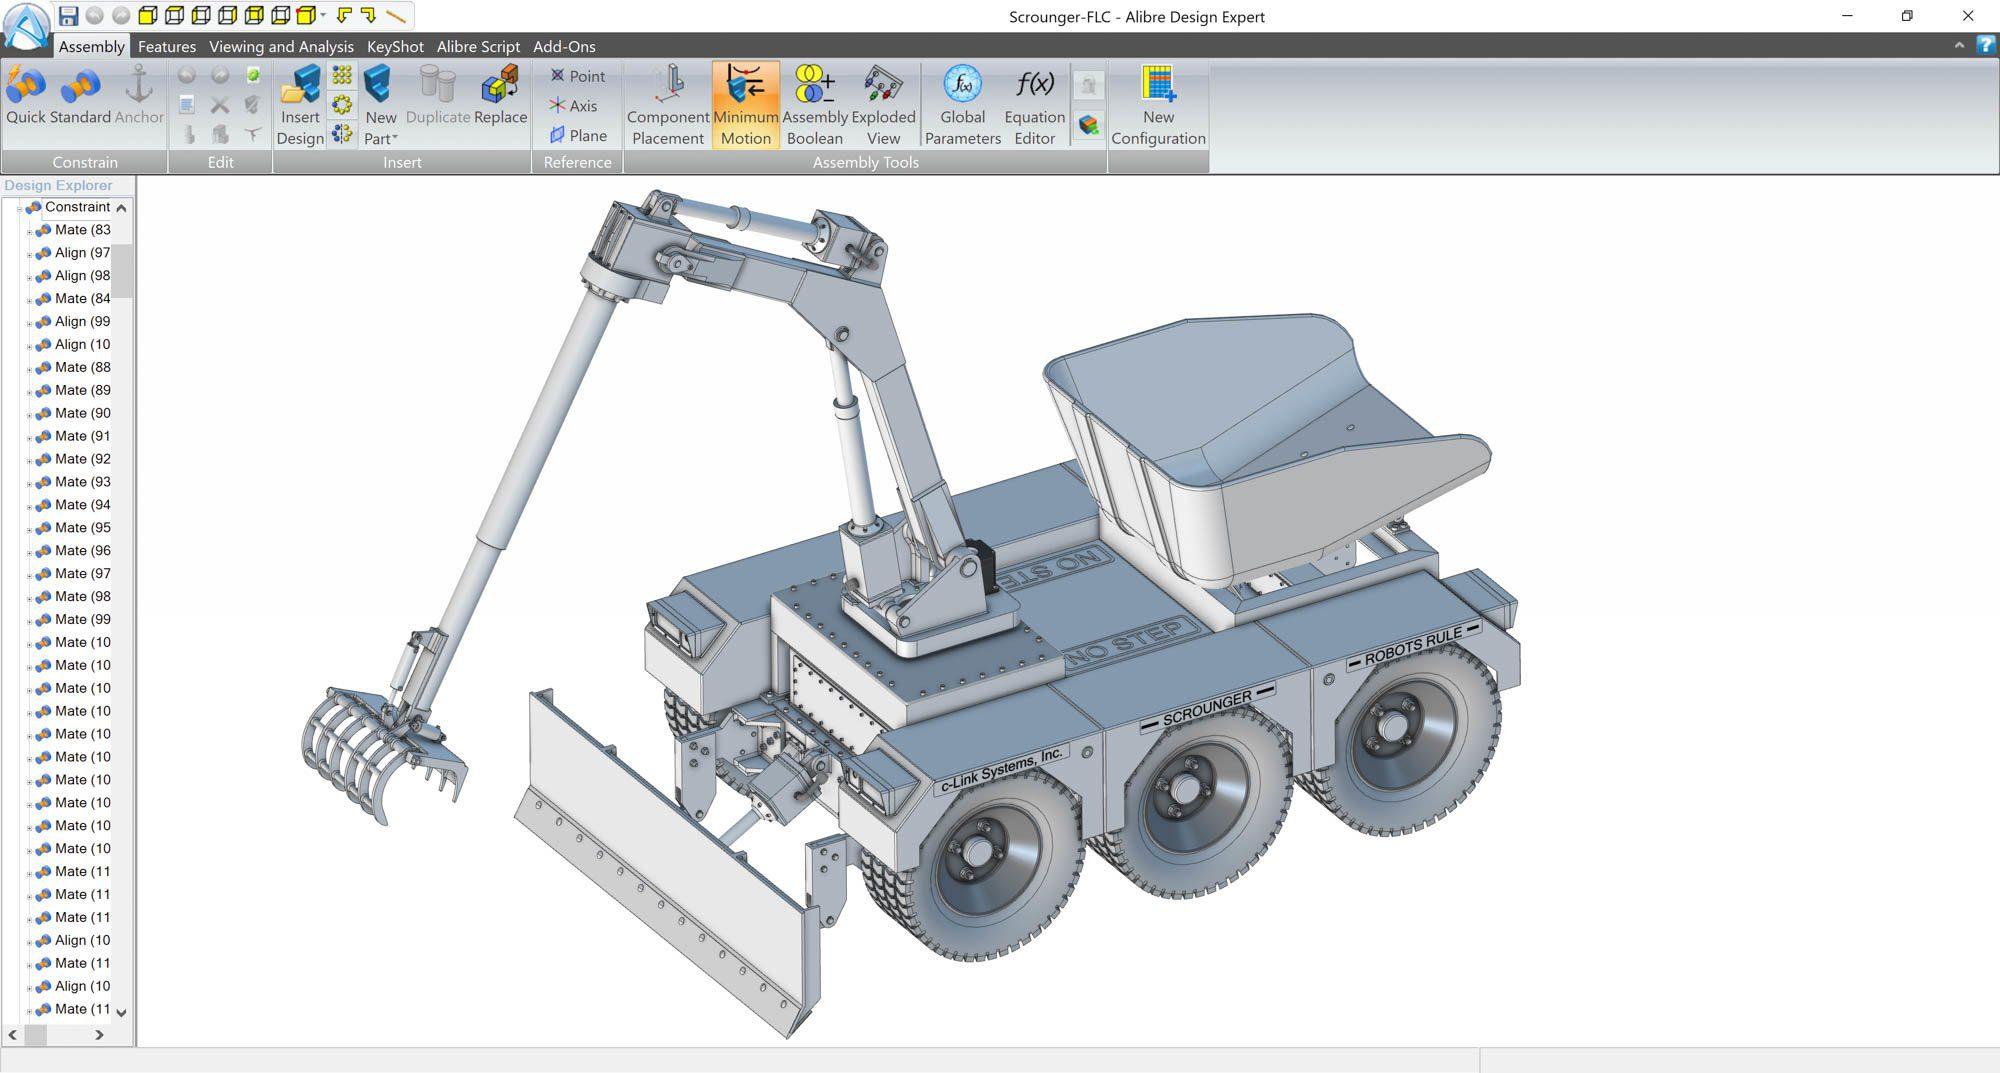 alibre-design-zrzut-ekranu-robotyka-robot-strazacki